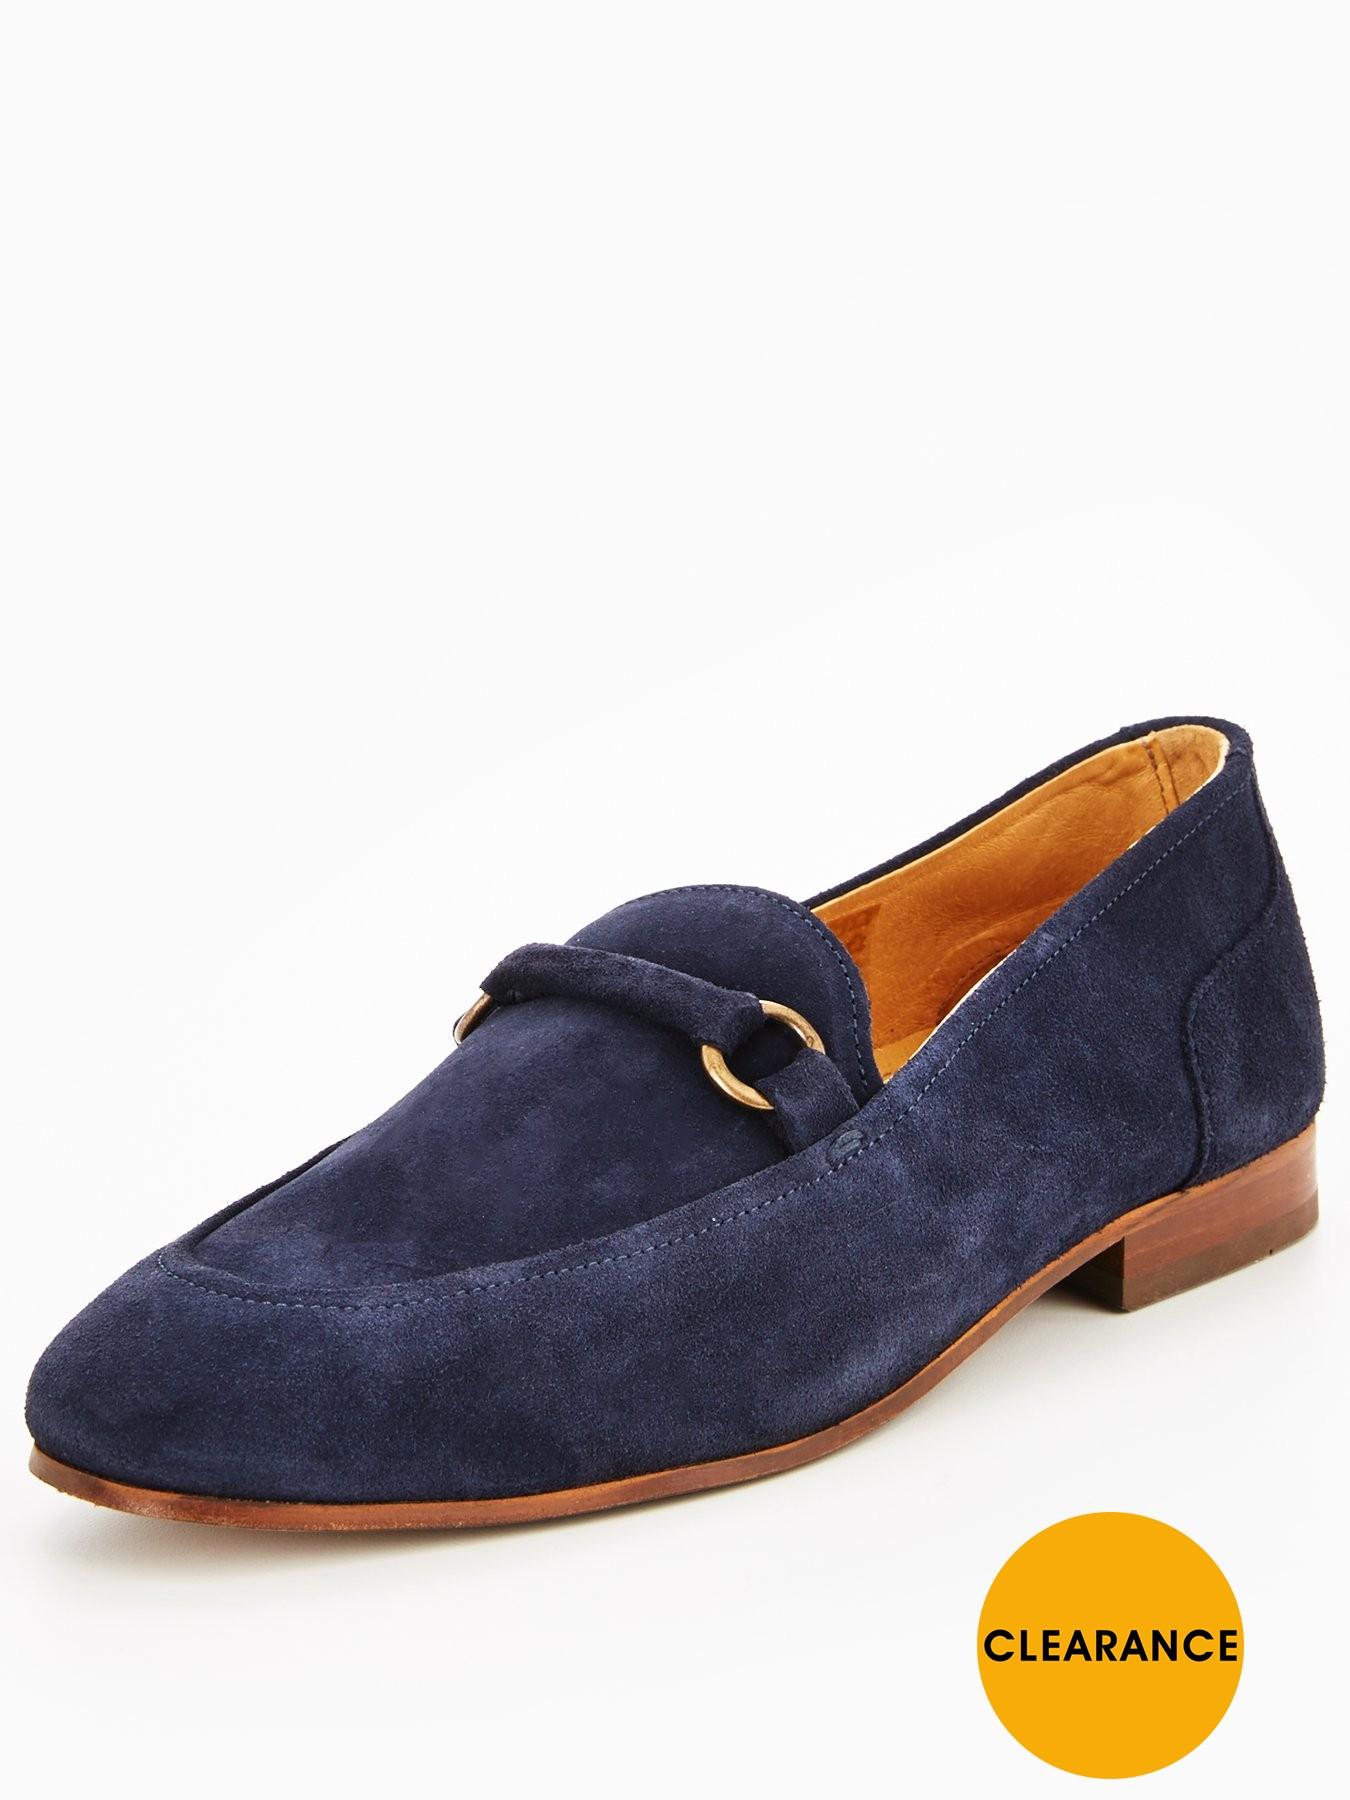 Hudson London HUDSON RENZO SUEDE LOAFER 1600173815 Men's Shoes Hudson London Shoes